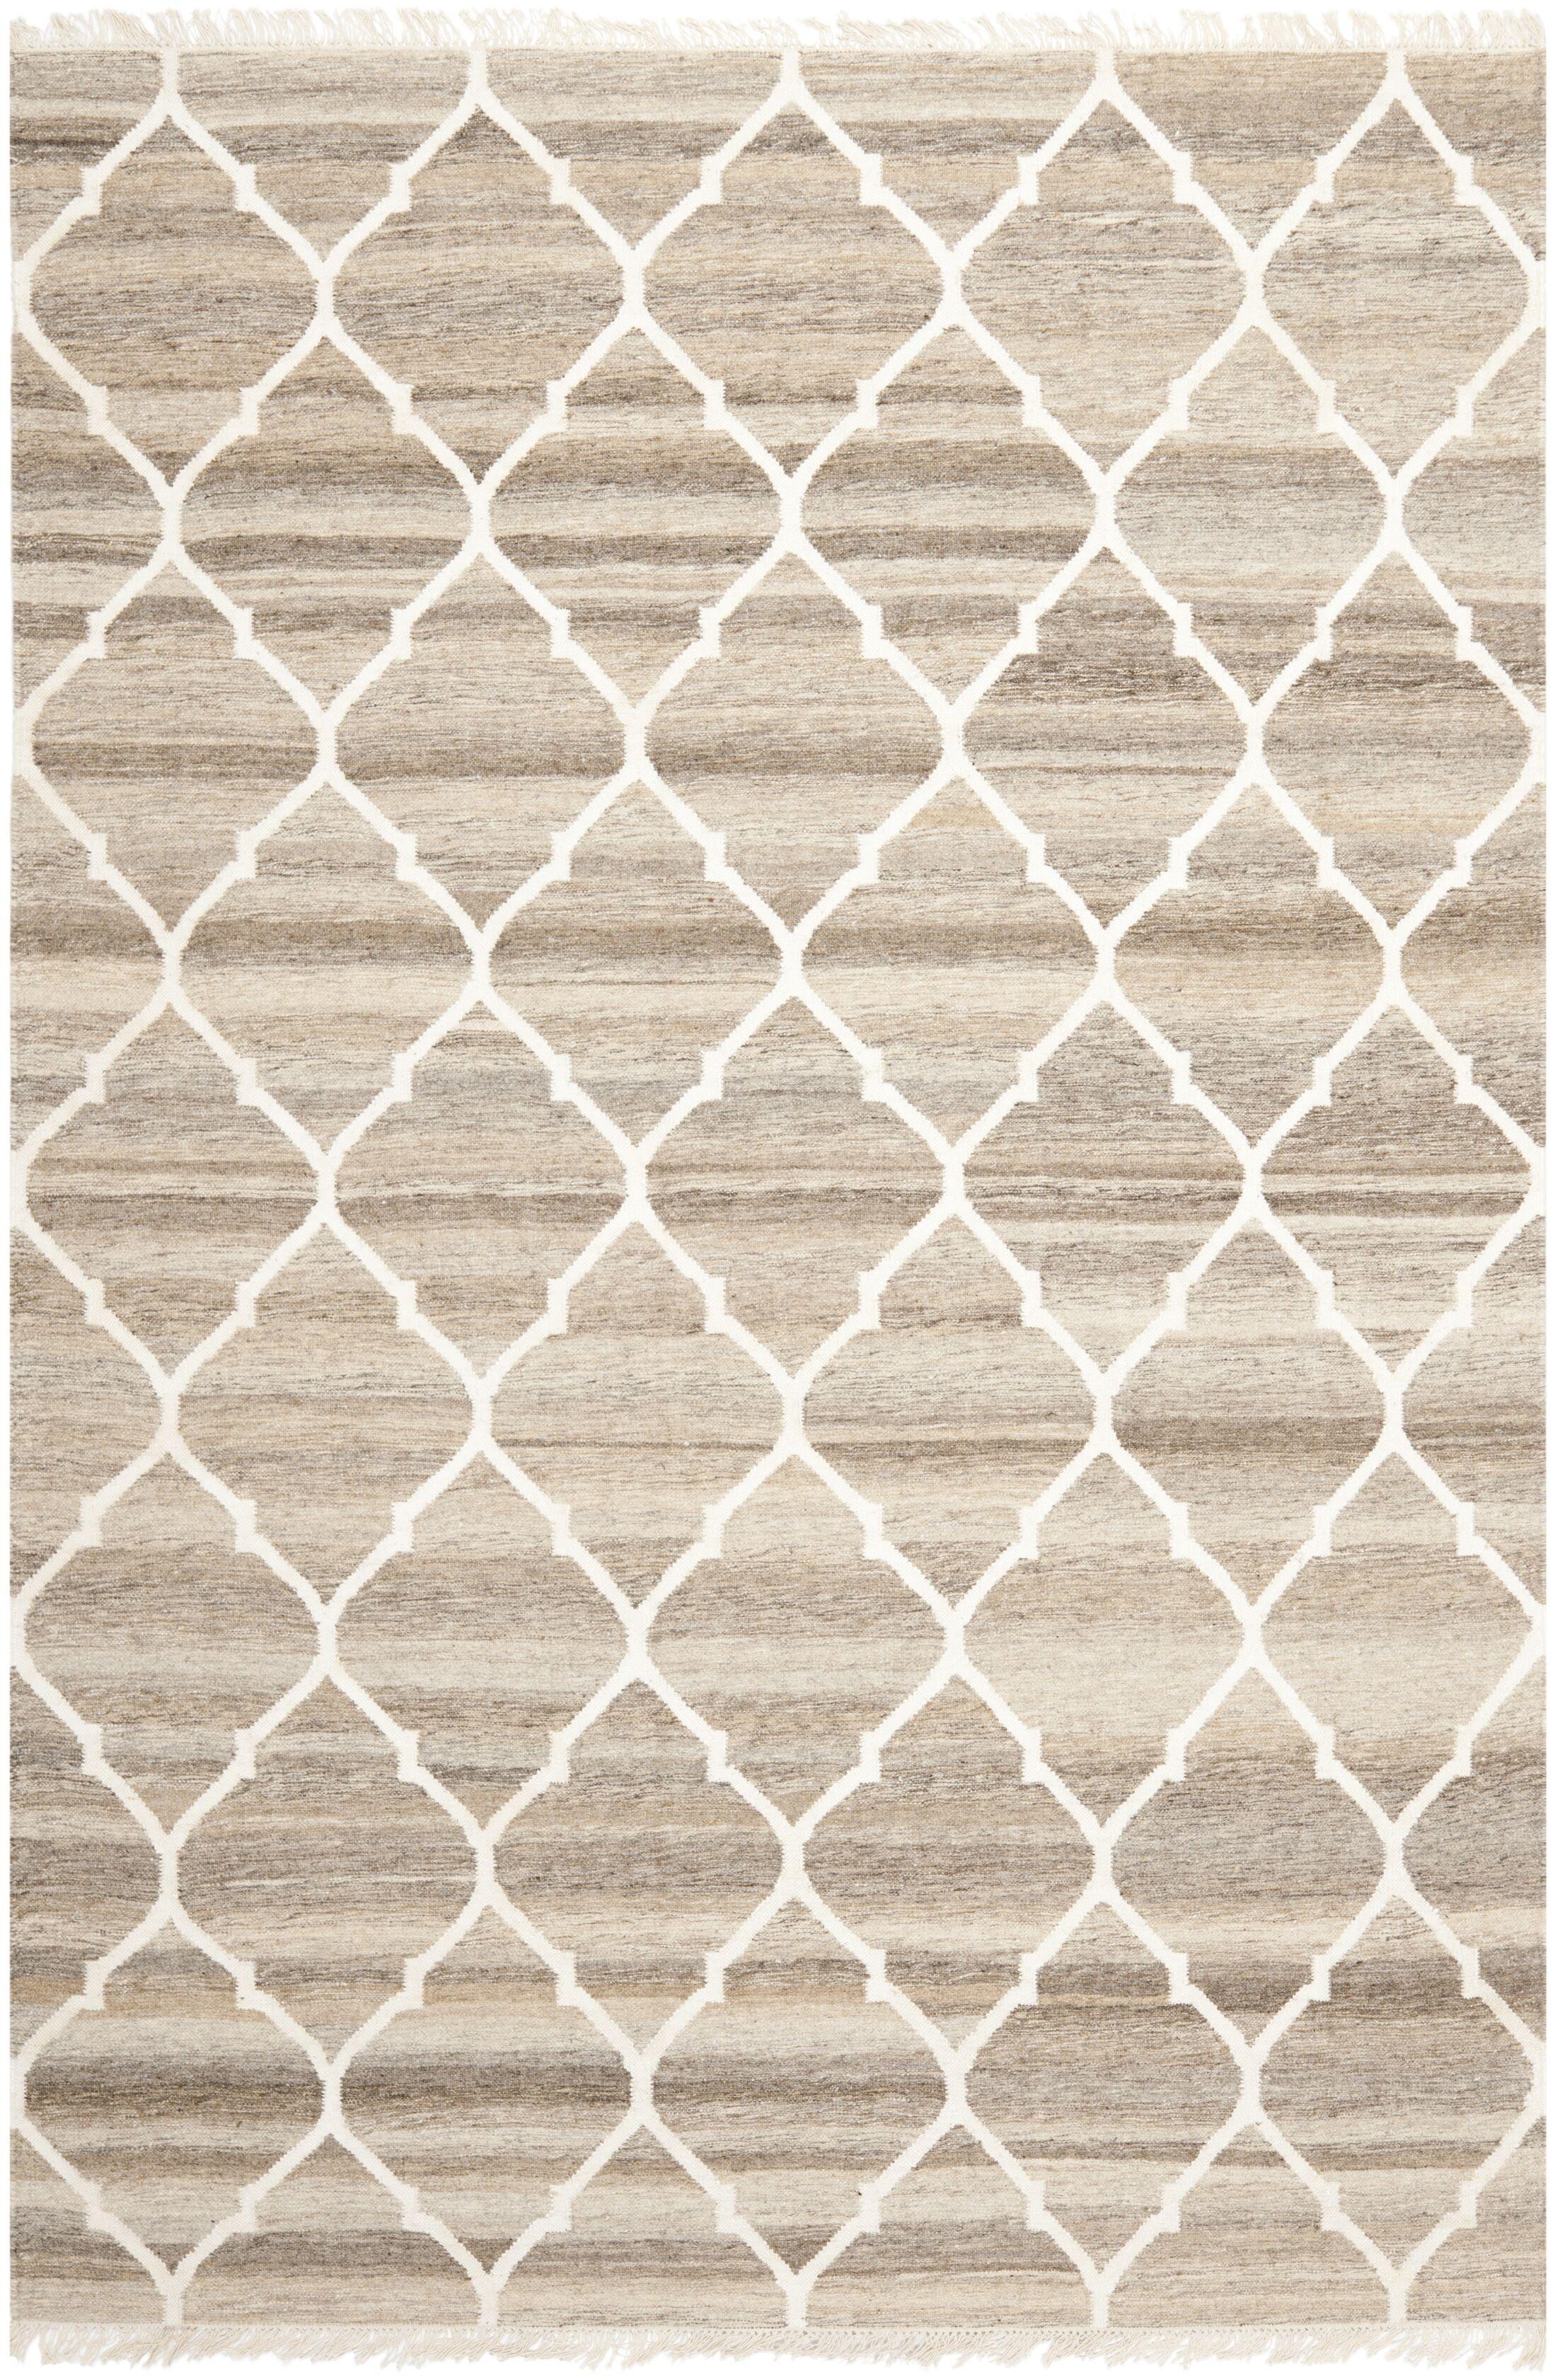 Natural Kilim Hand-Woven Light Gray/Ivory Area Rug Rug Size: Rectangle 4' x 6'